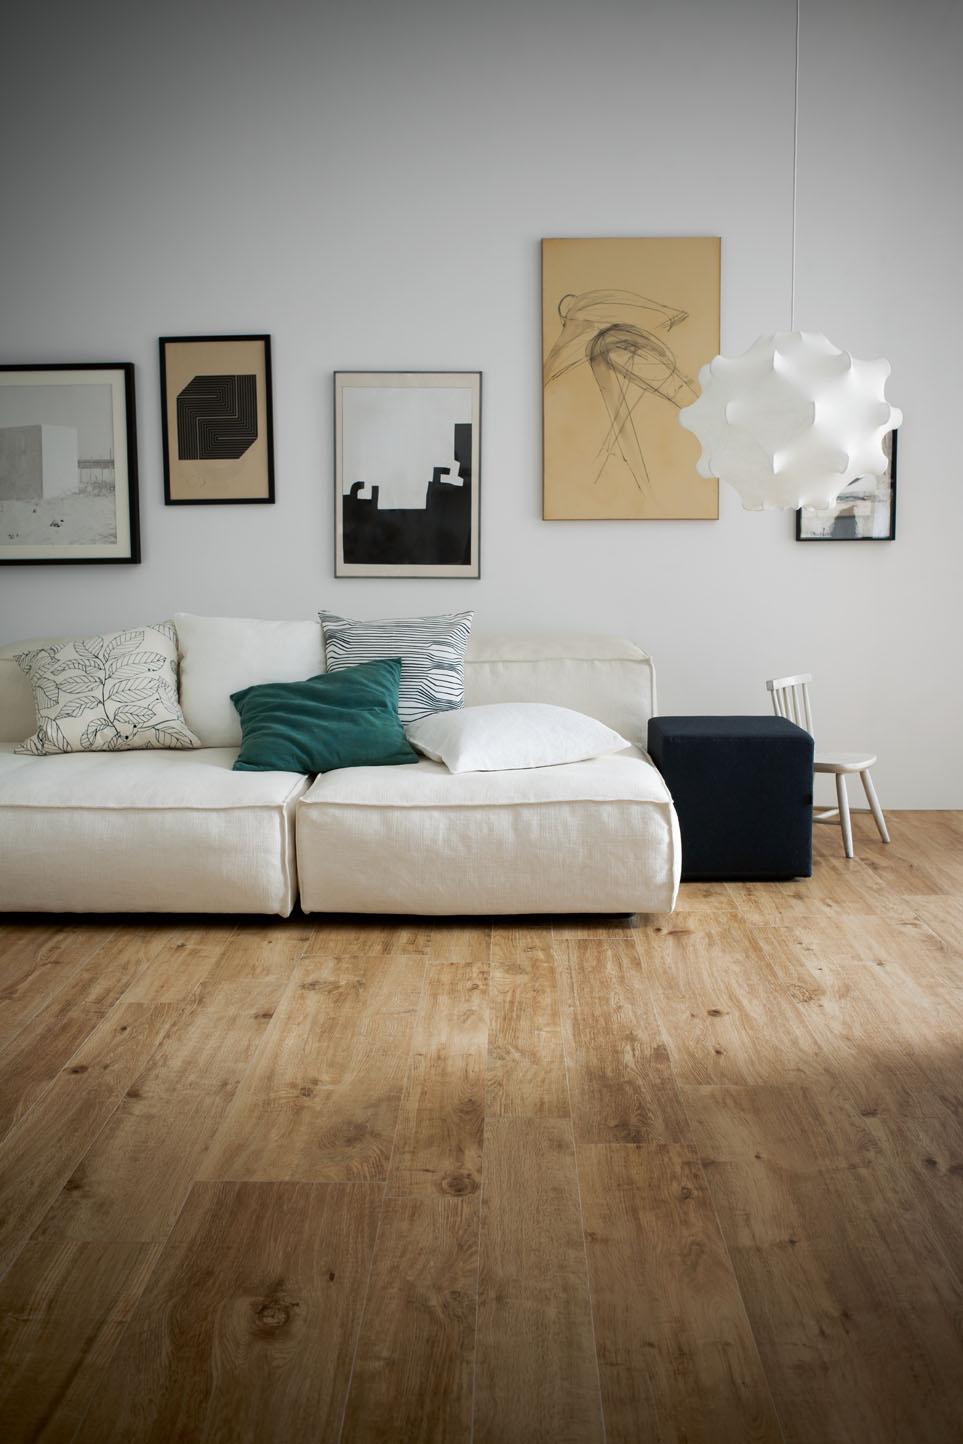 KOL tegels keramisch hout